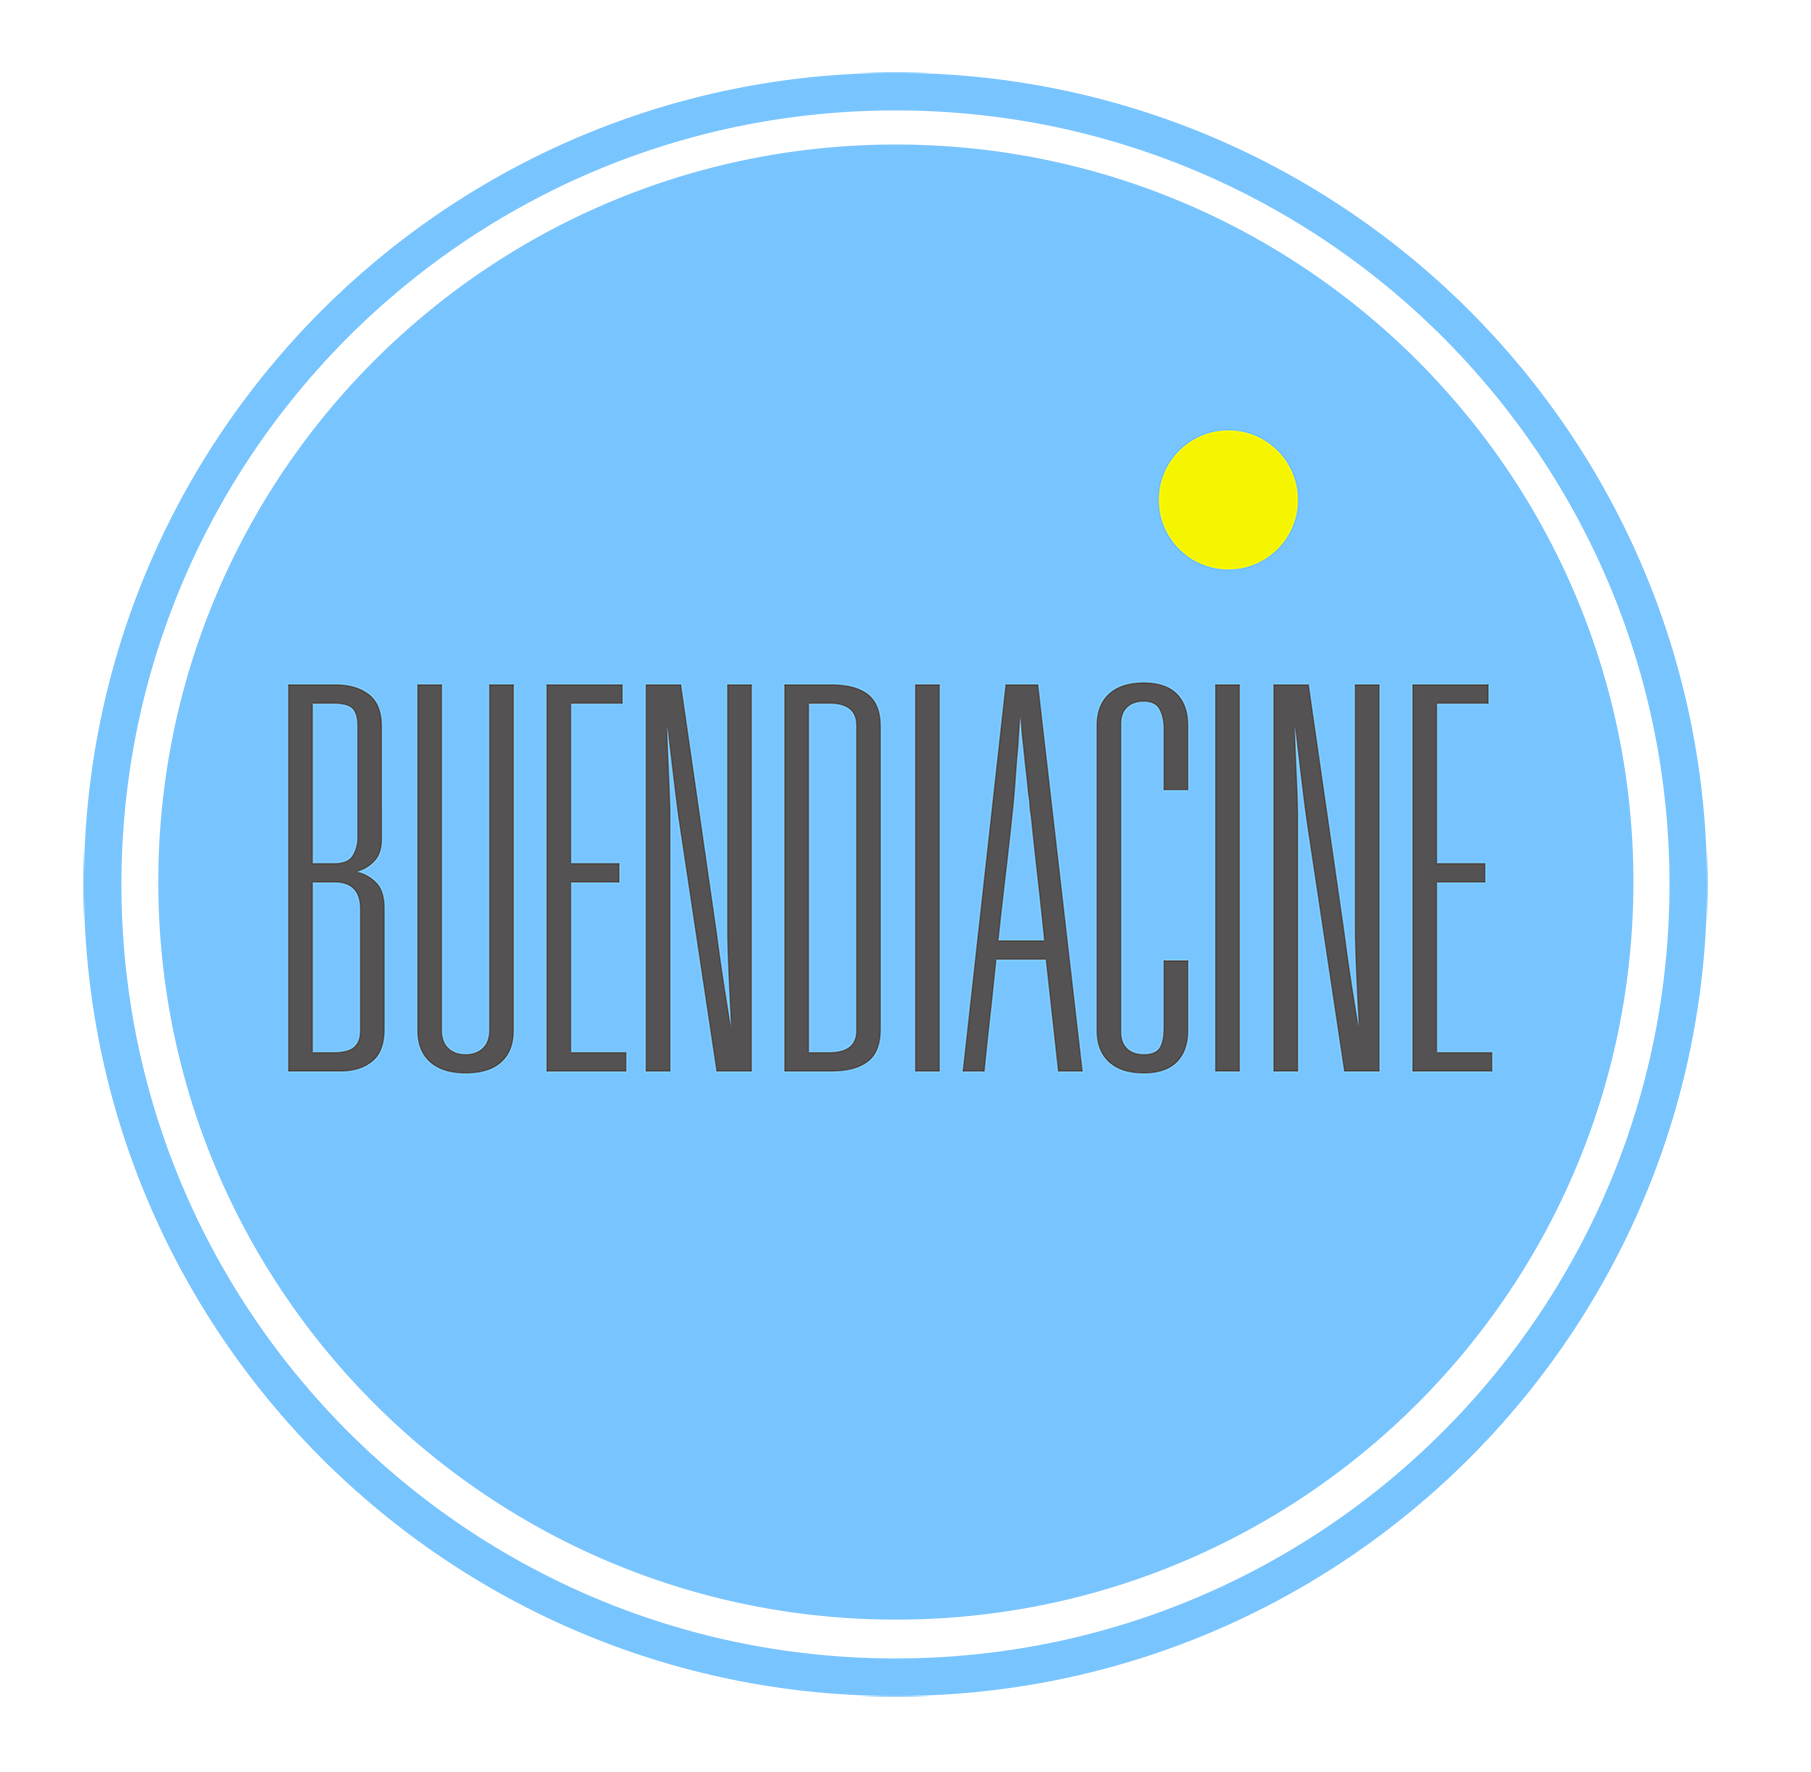 BuendiaCine